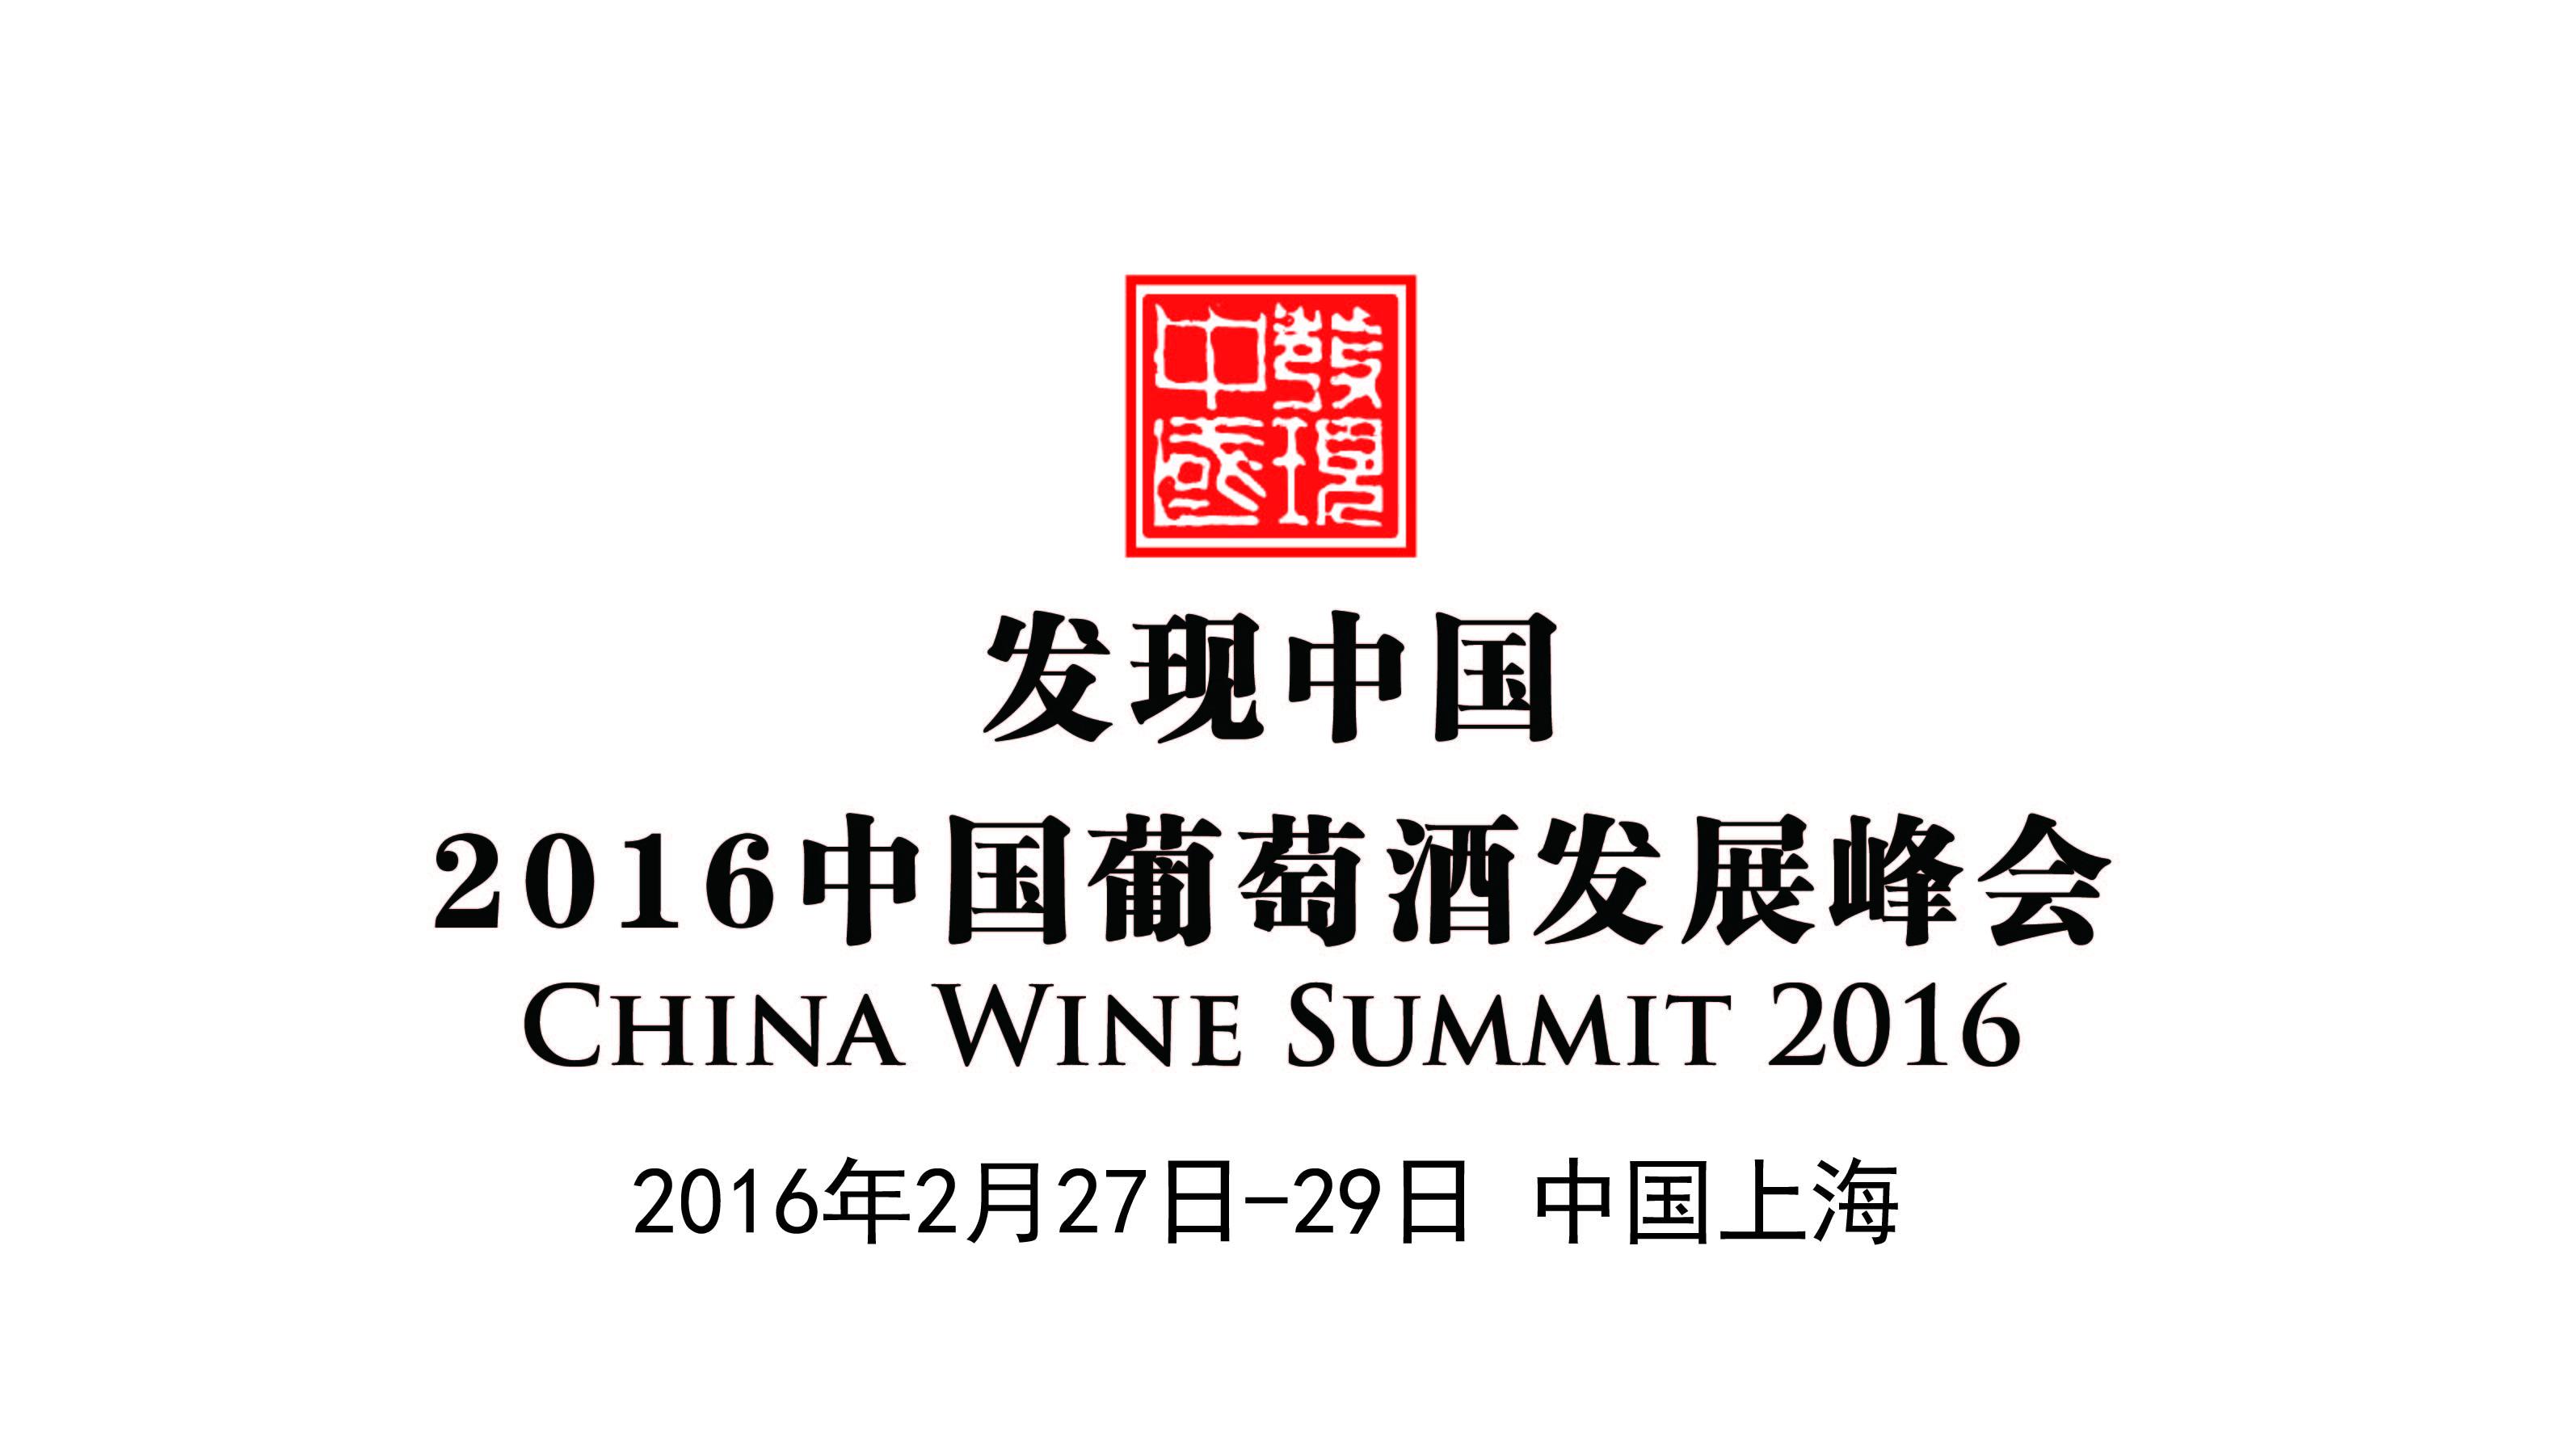 China Wine Summit